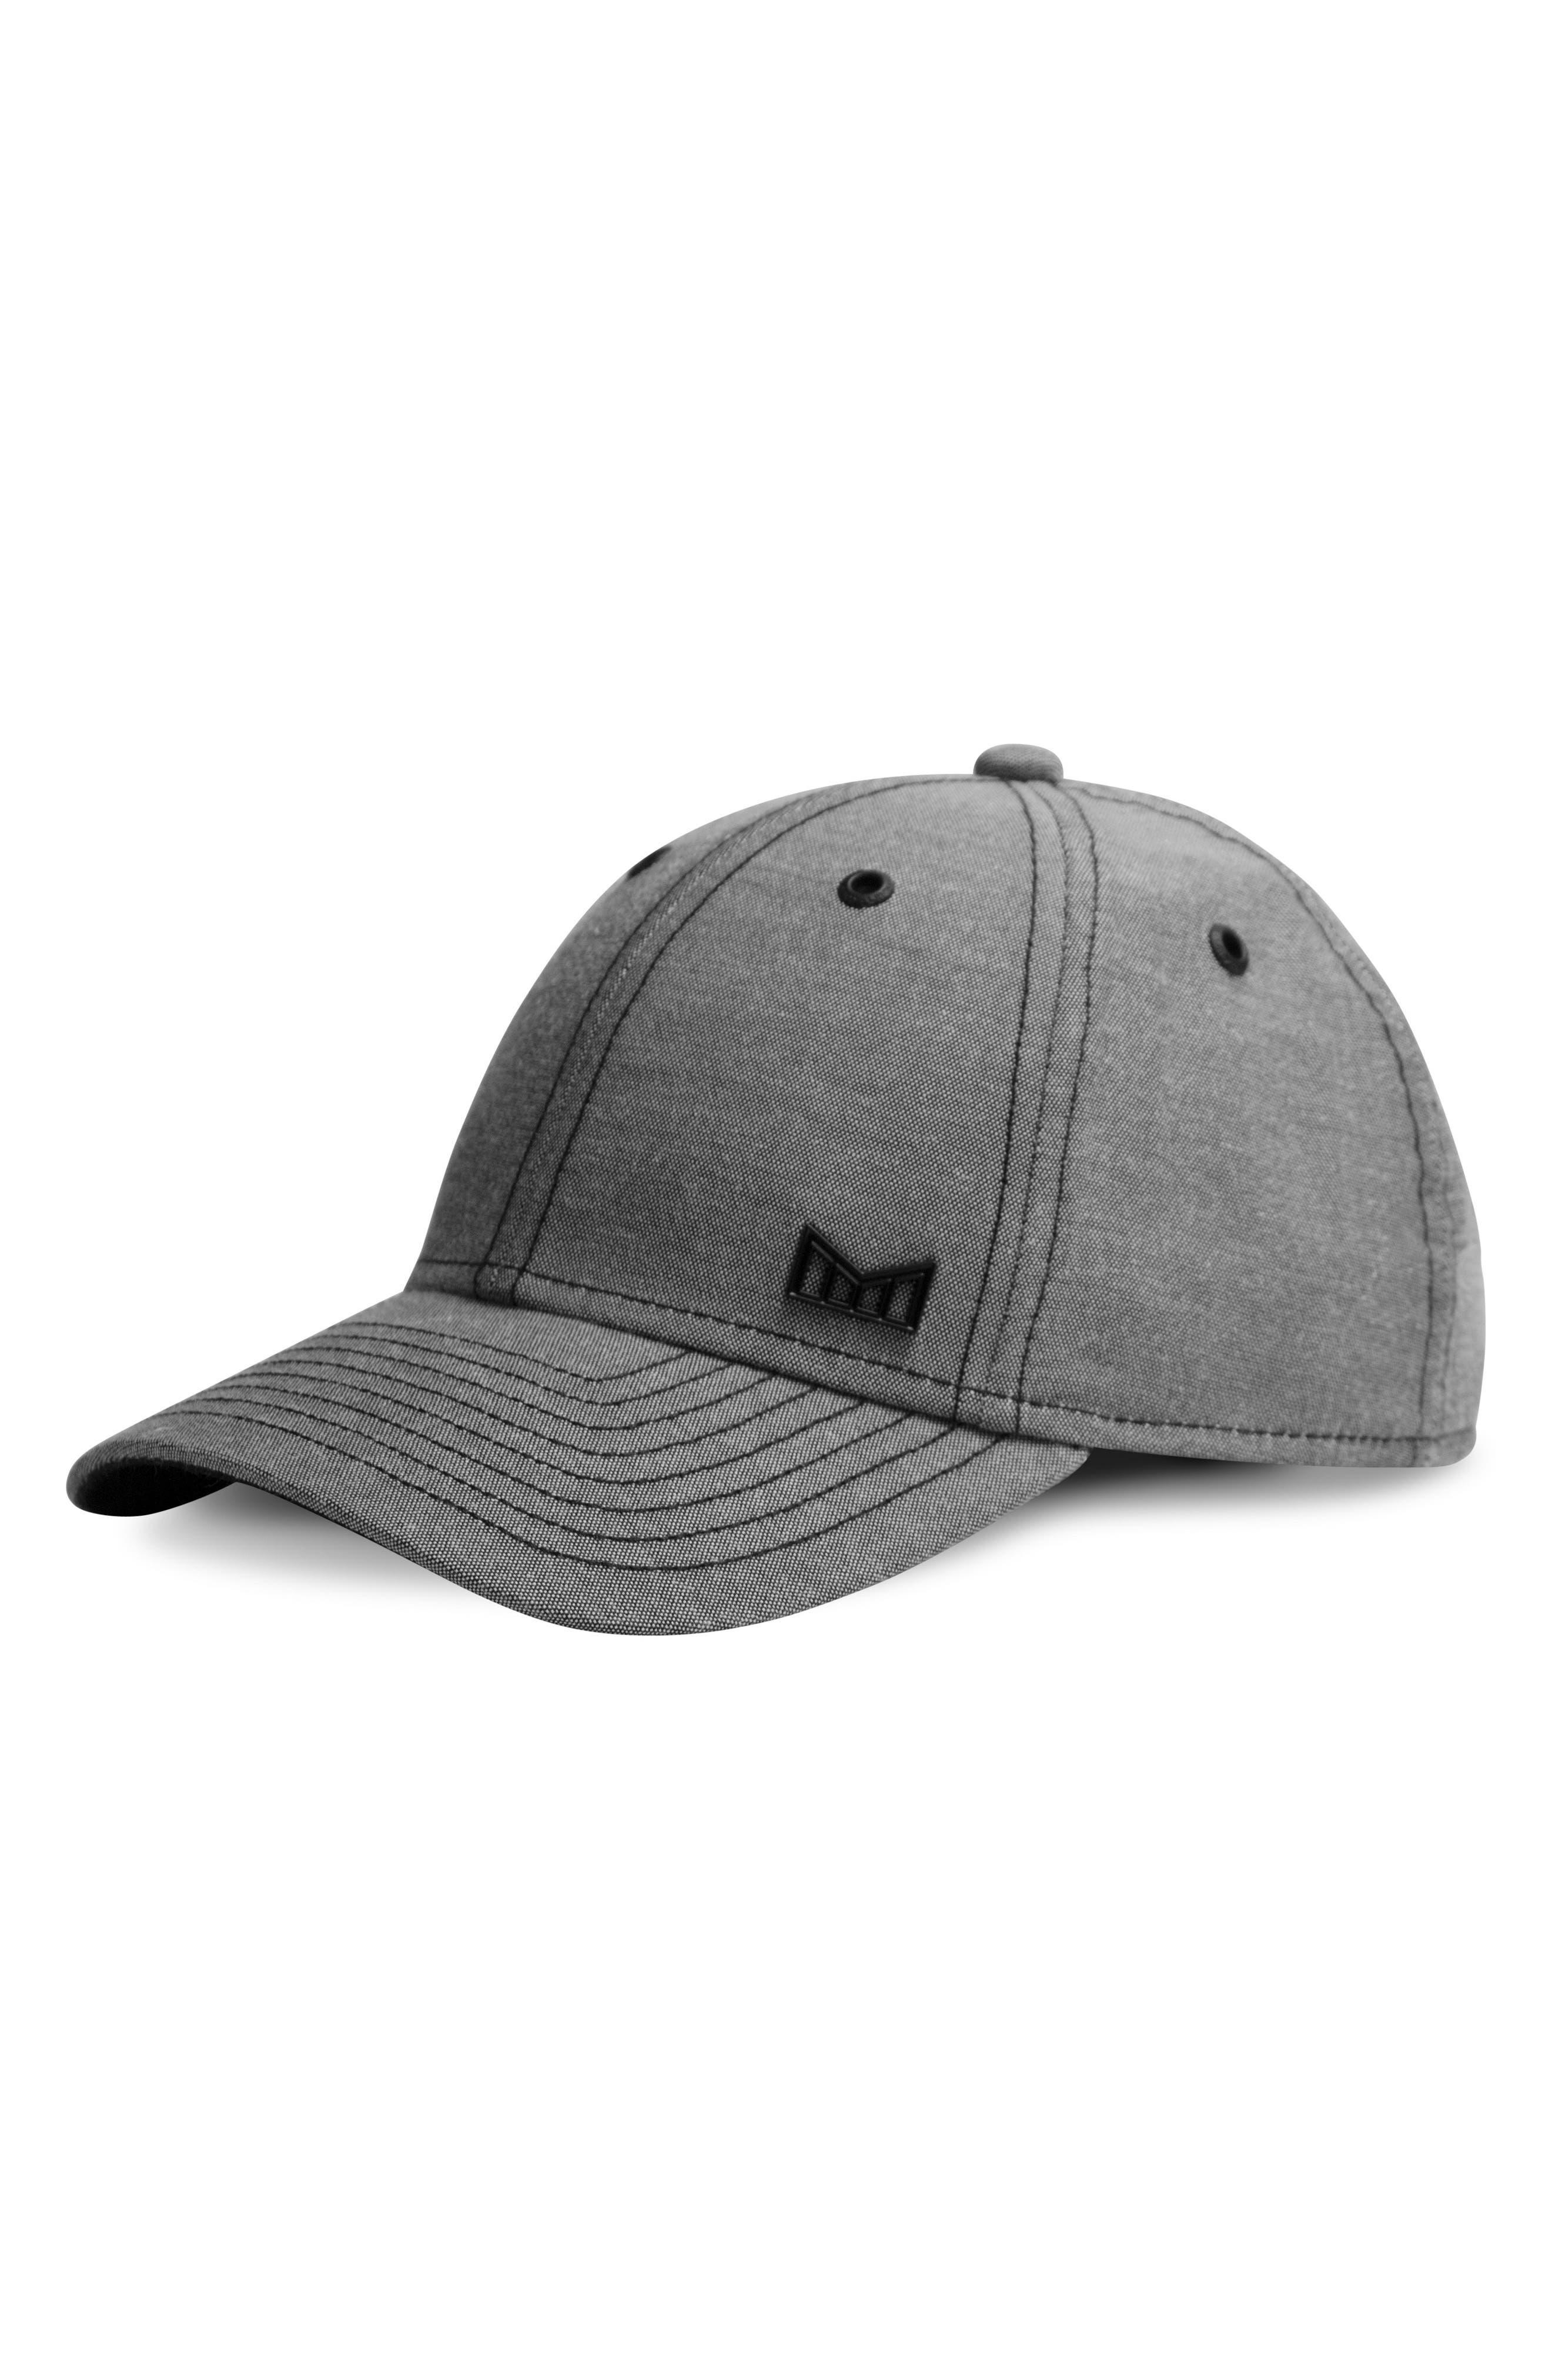 Scholar Snapback Baseball Cap,                             Main thumbnail 1, color,                             Black